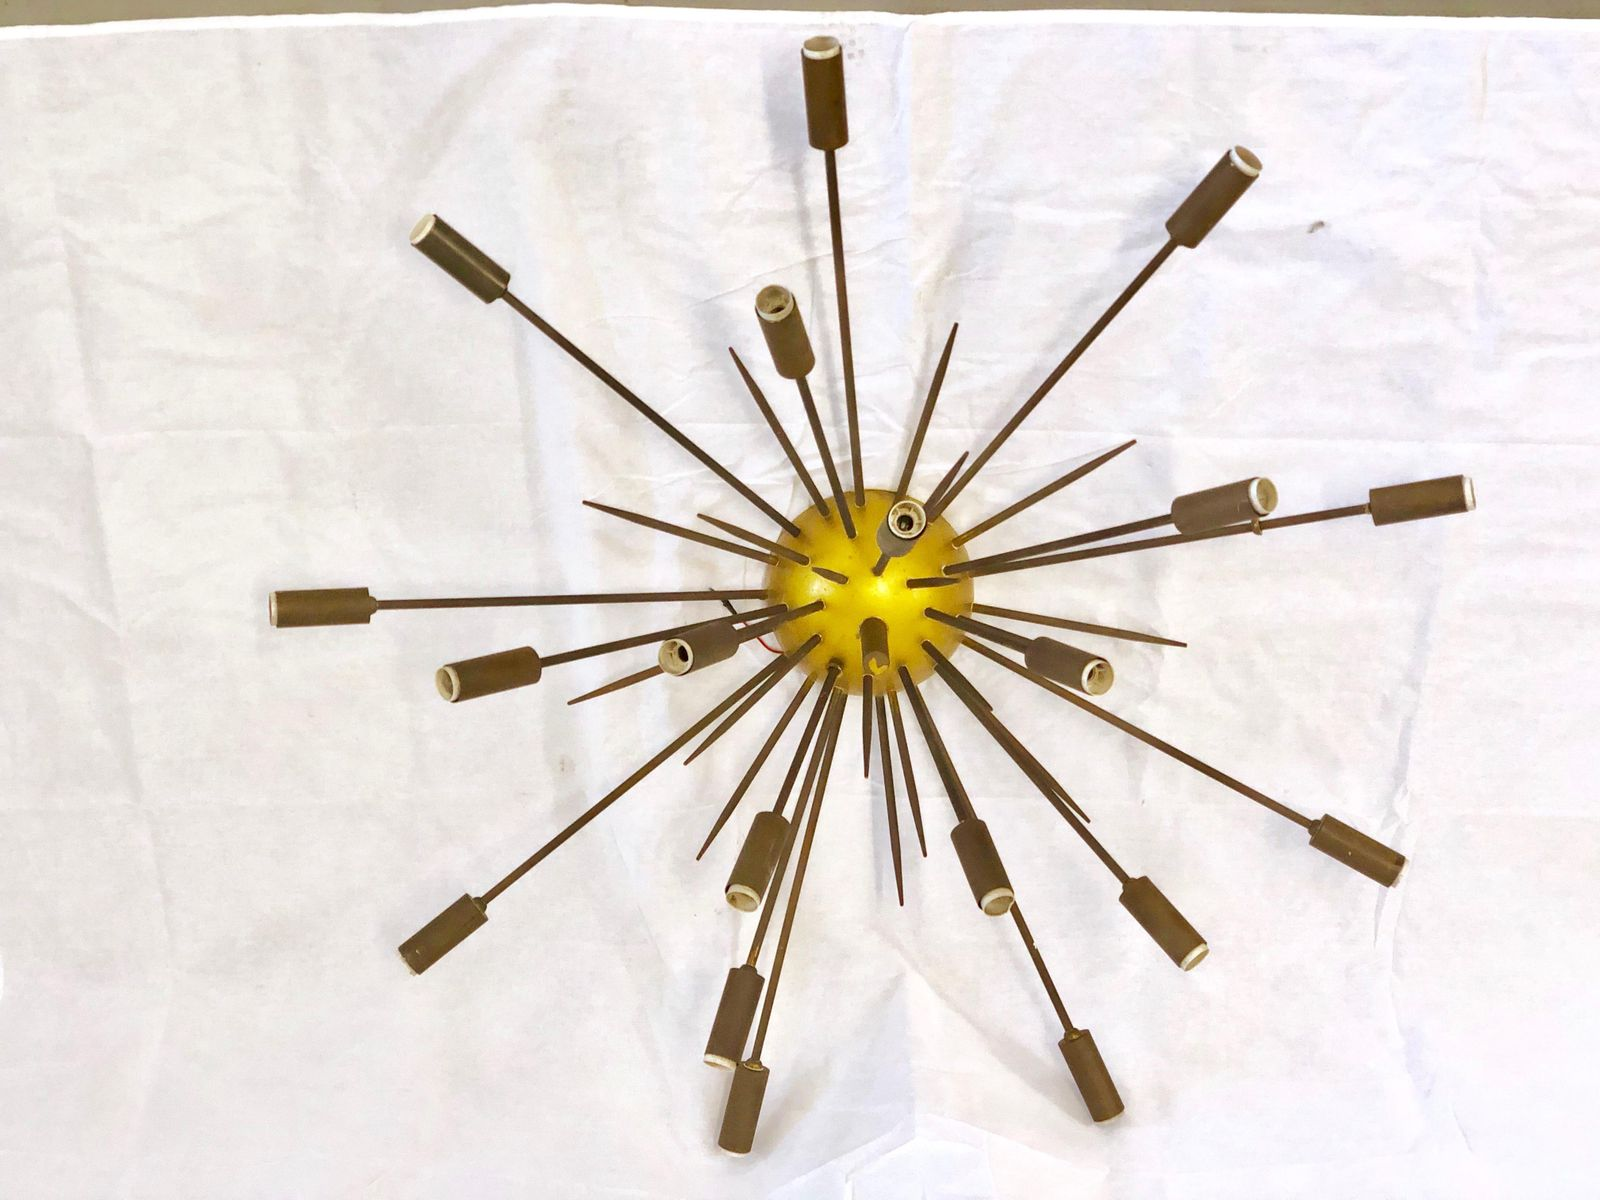 Brass chandelier from stilnovo 1950s for sale at pamono brass chandelier from stilnovo 1950s aloadofball Gallery